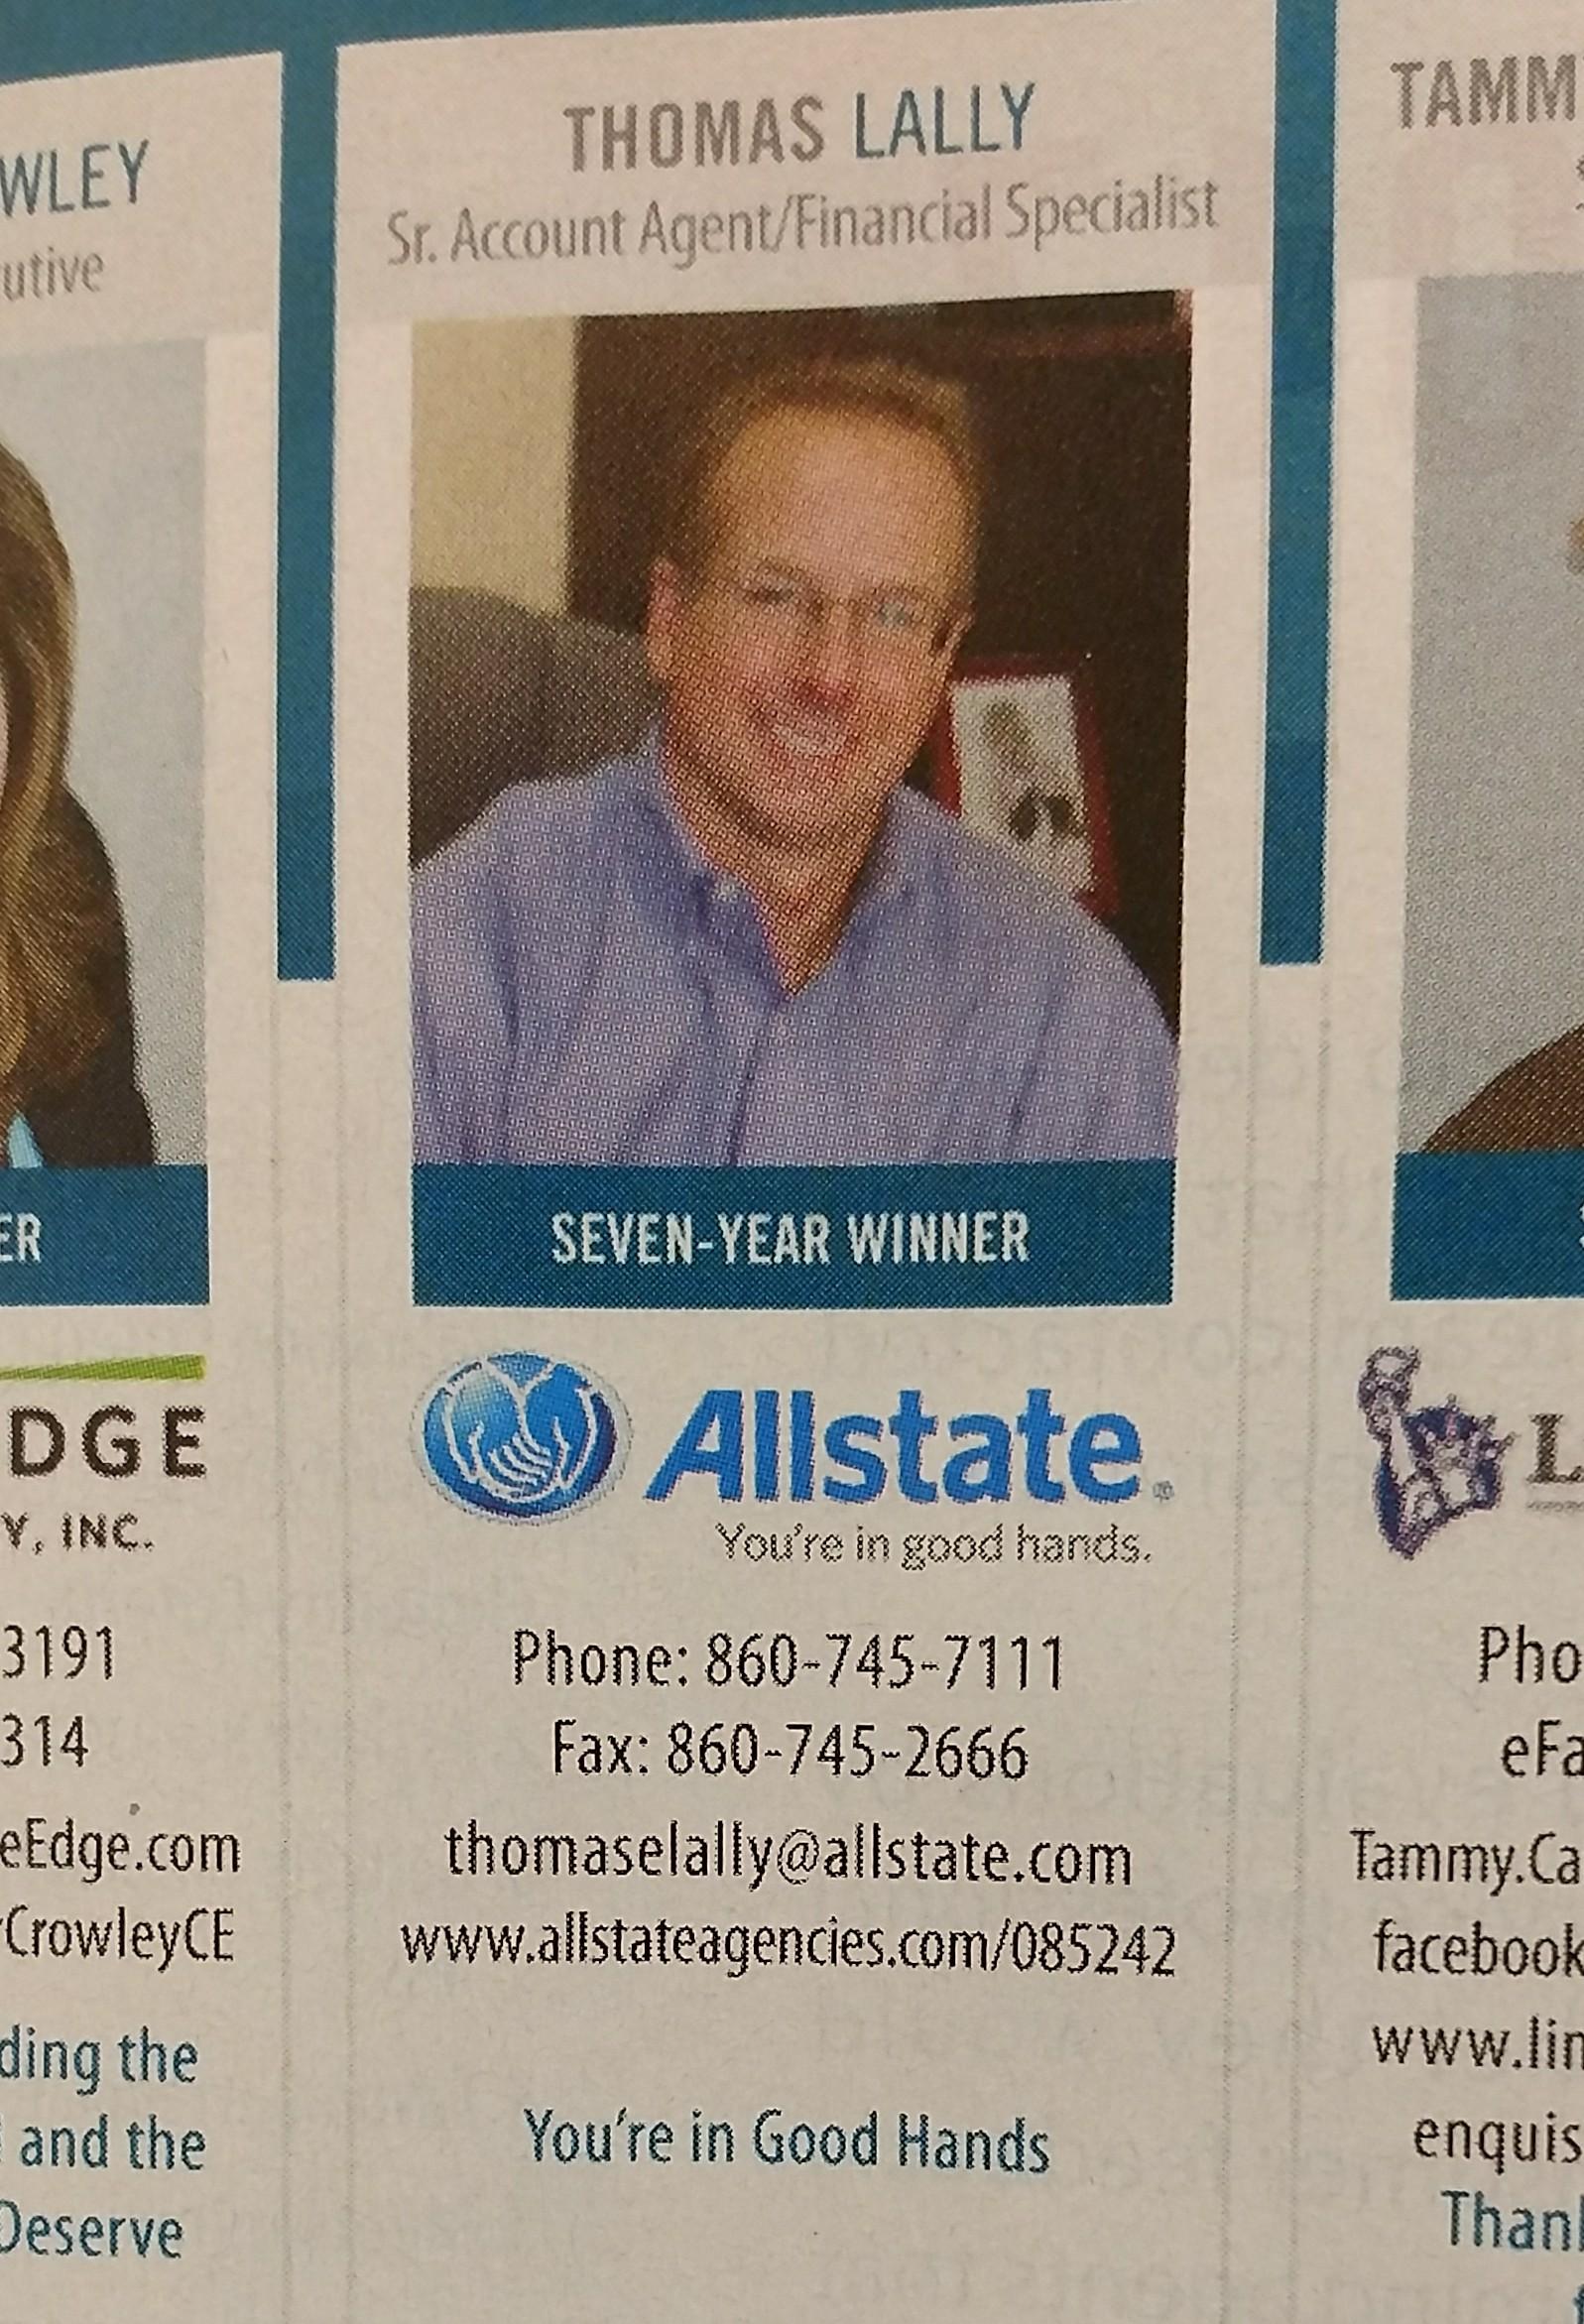 Thomas Lally: Allstate Insurance